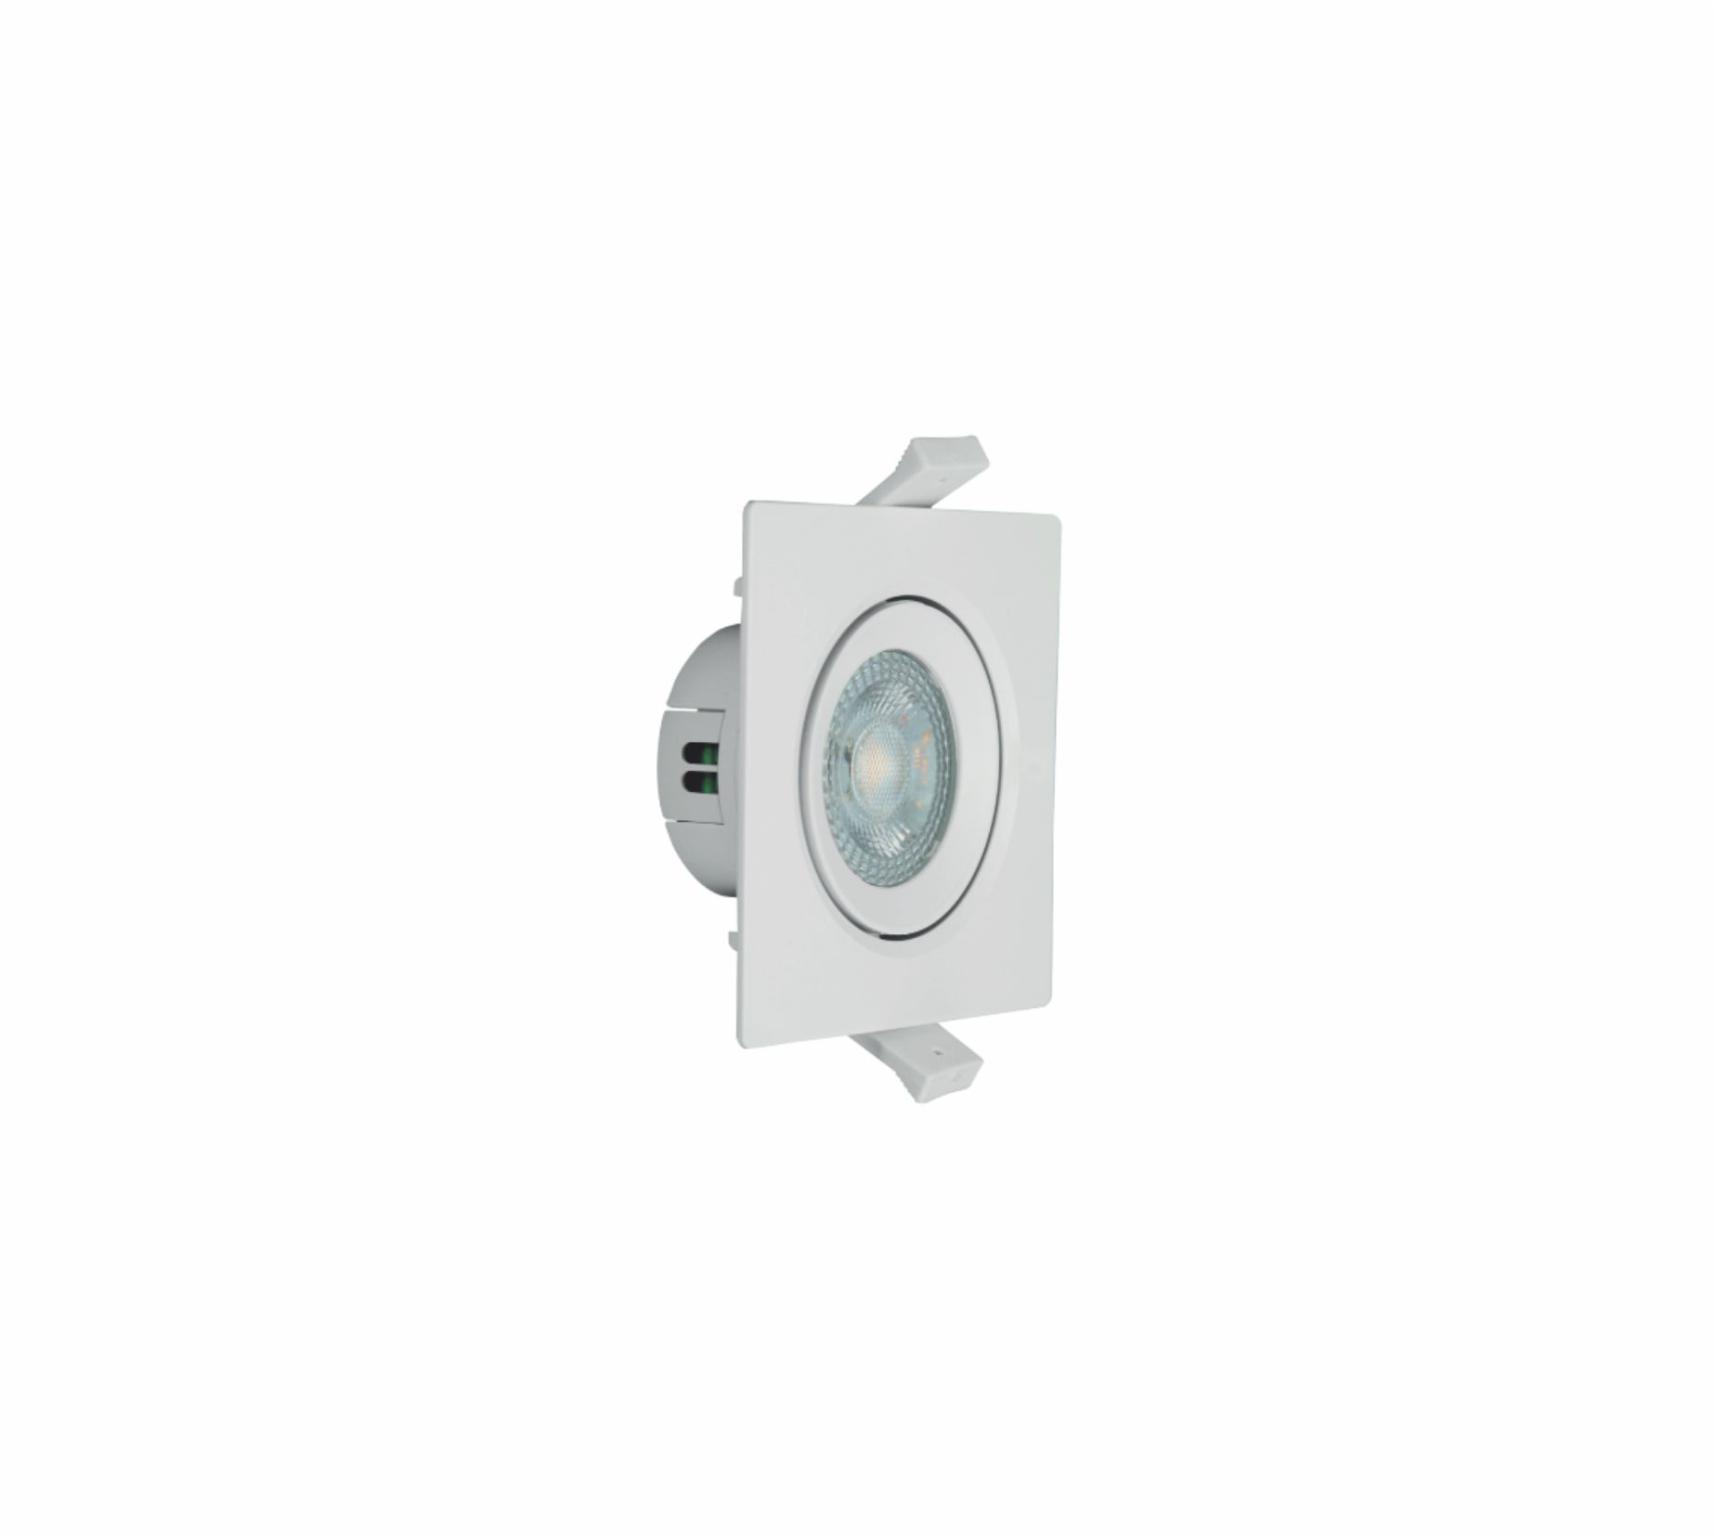 SPOT LED MR11 quadrado branco 3,5W AUTOVOLT 3000K